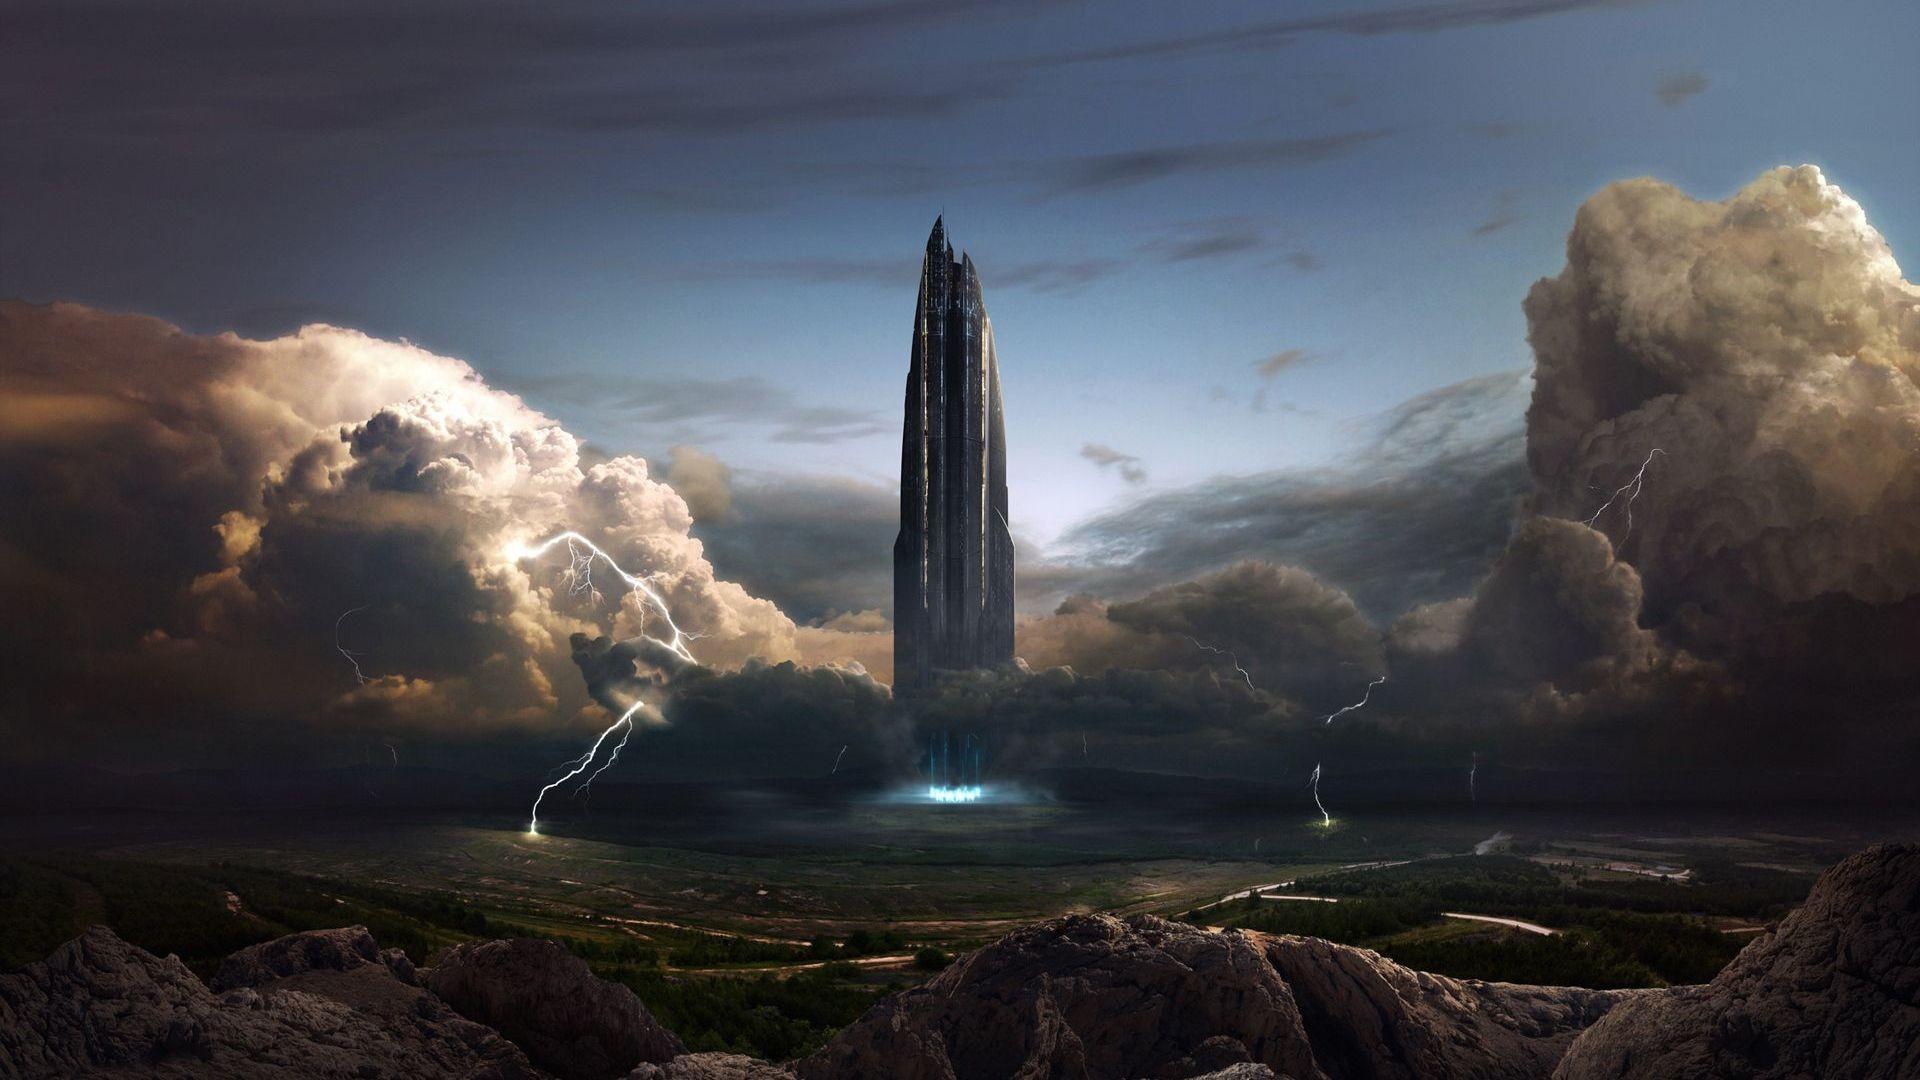 Sci Fi Wallpaper 2560x1440: Alien Spaceship Wallpaper (74+ Images